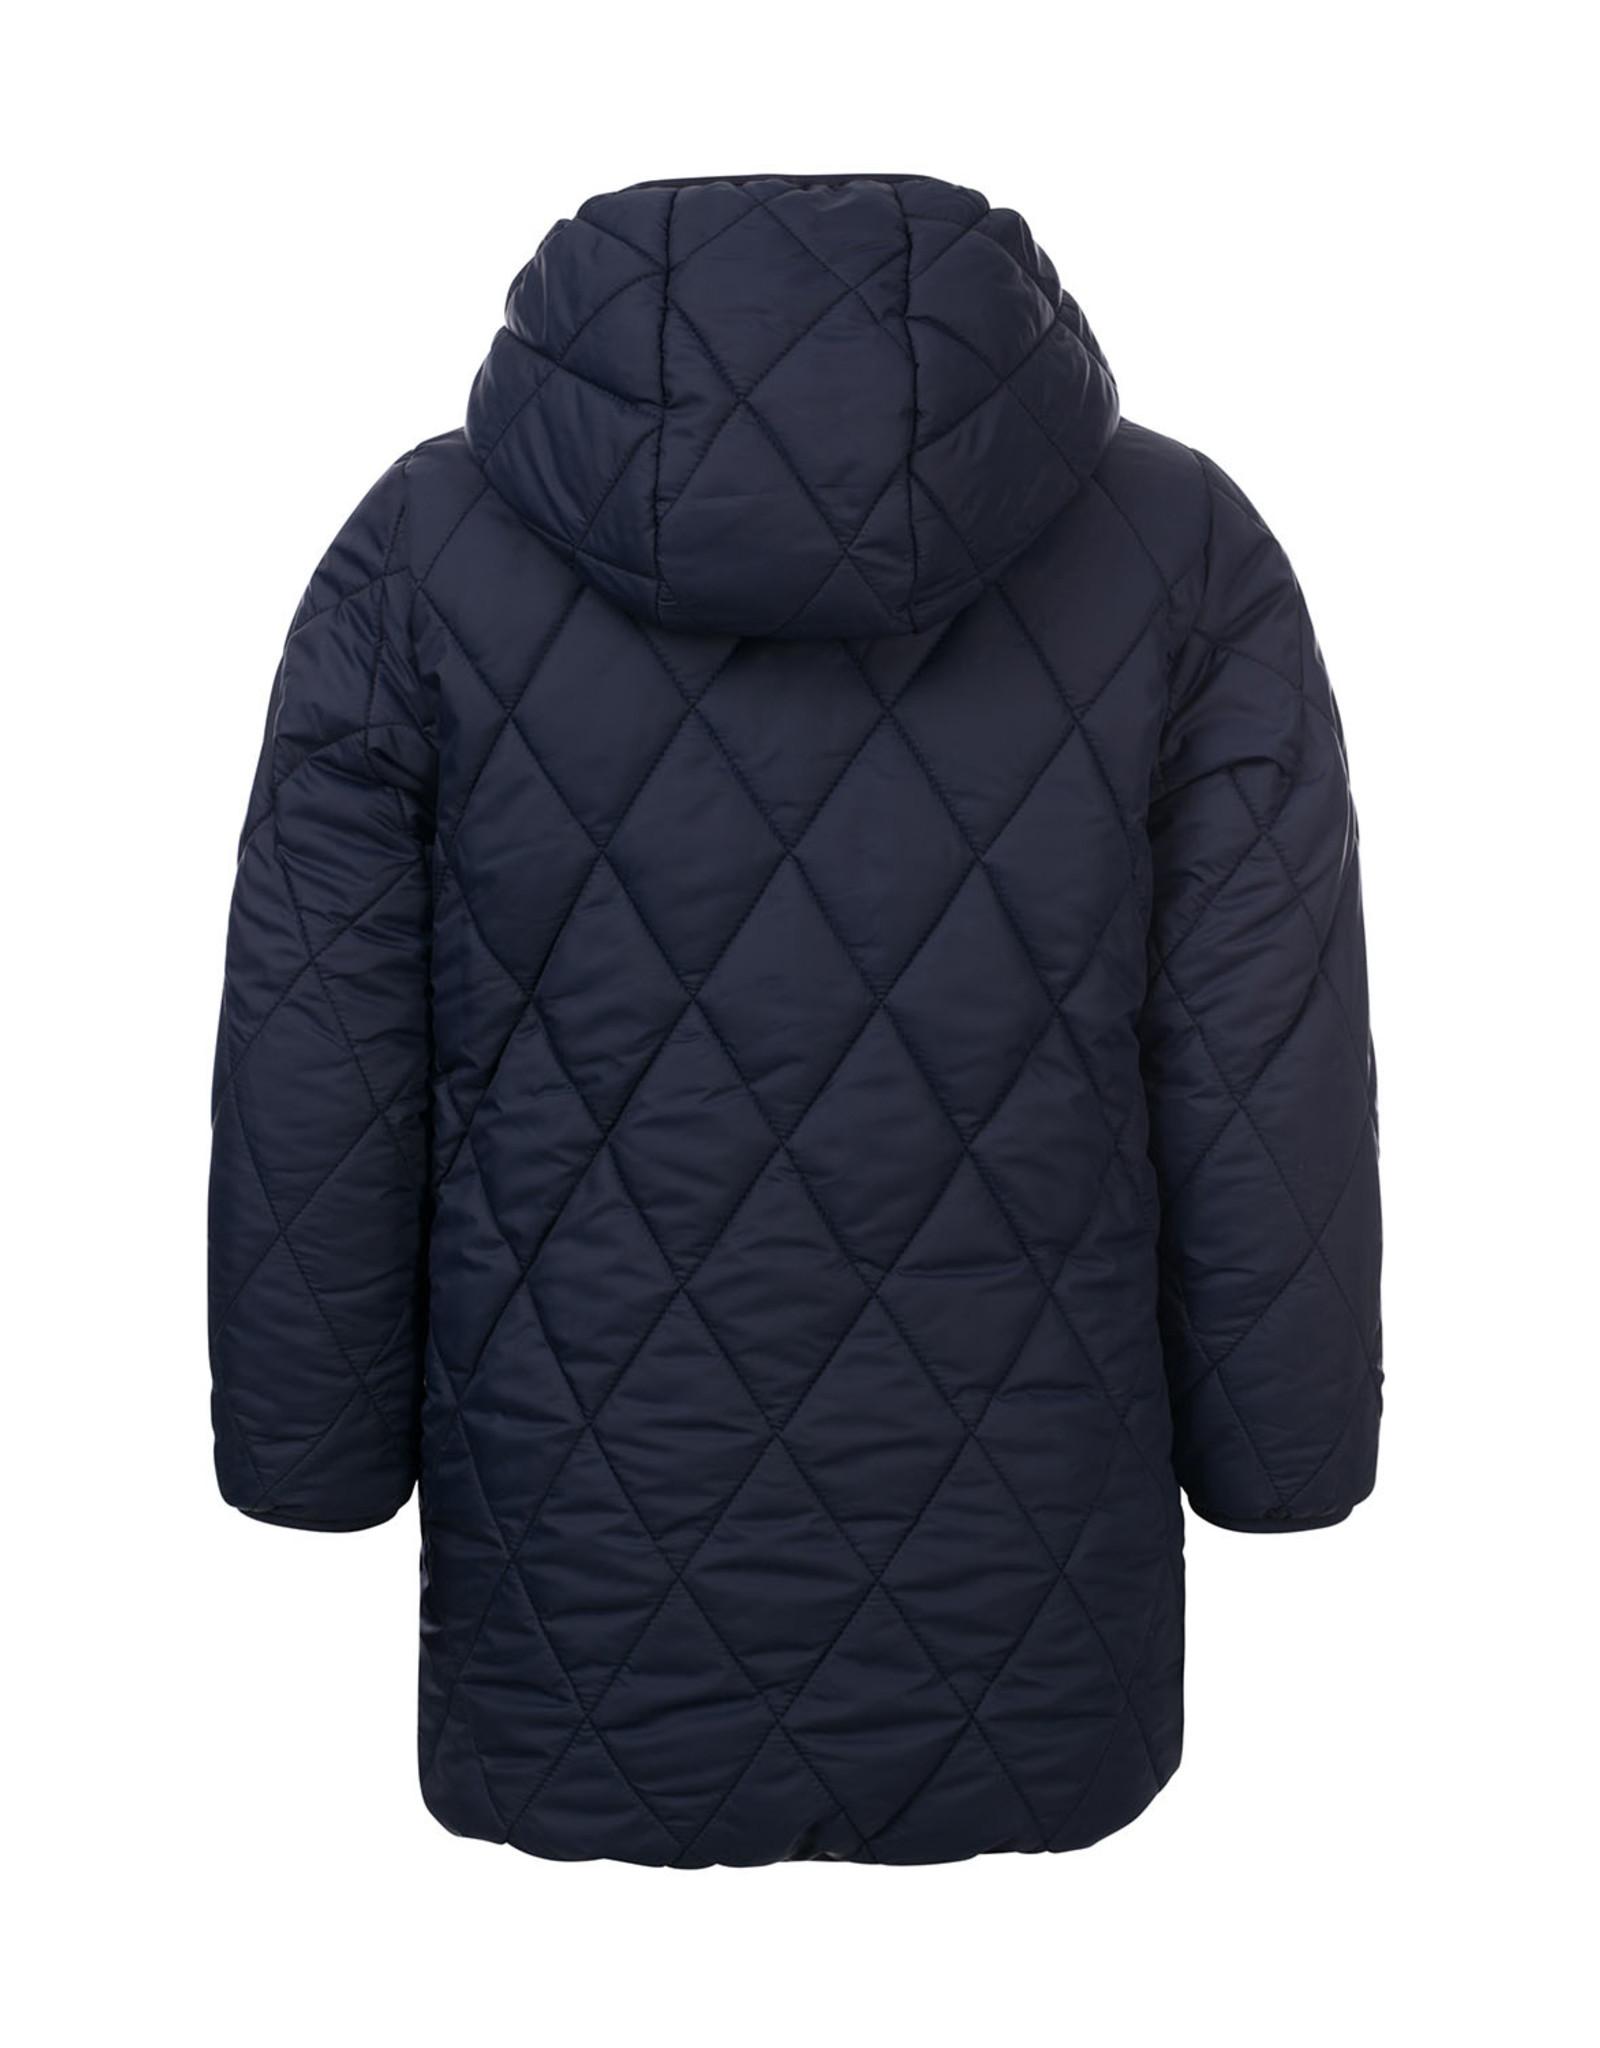 LOOXS Little Little jacket leopard reversible navy